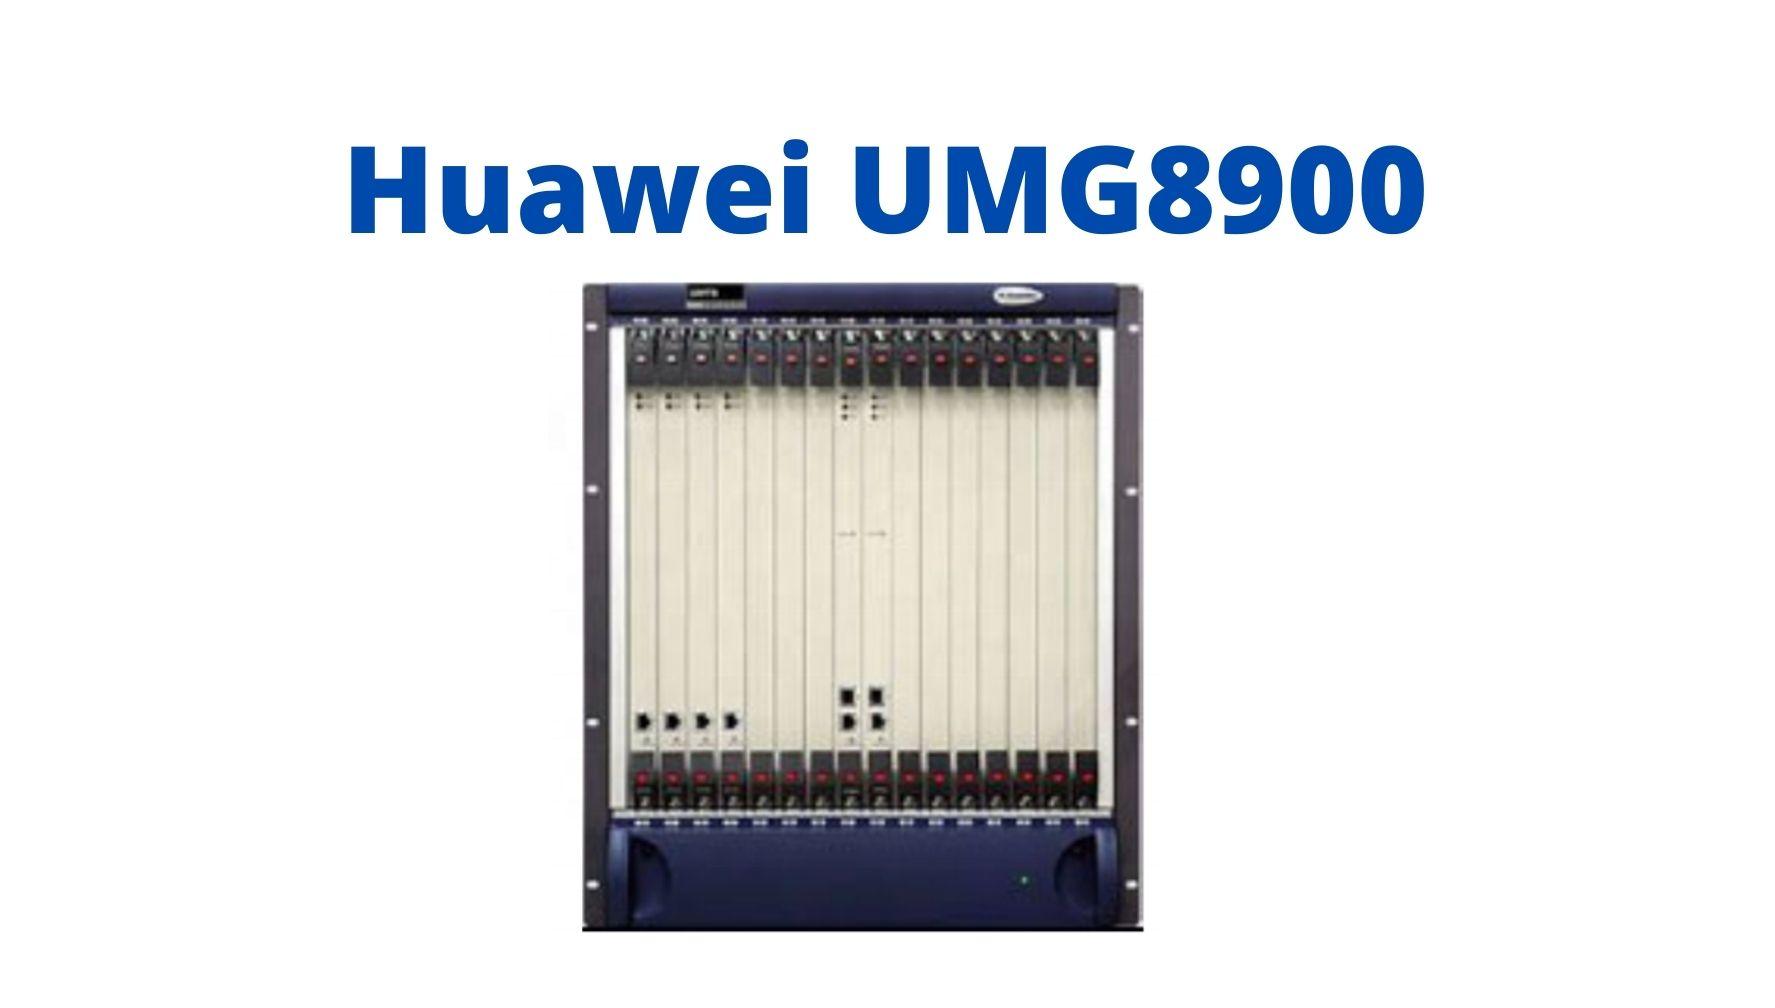 Huawei UMG8900